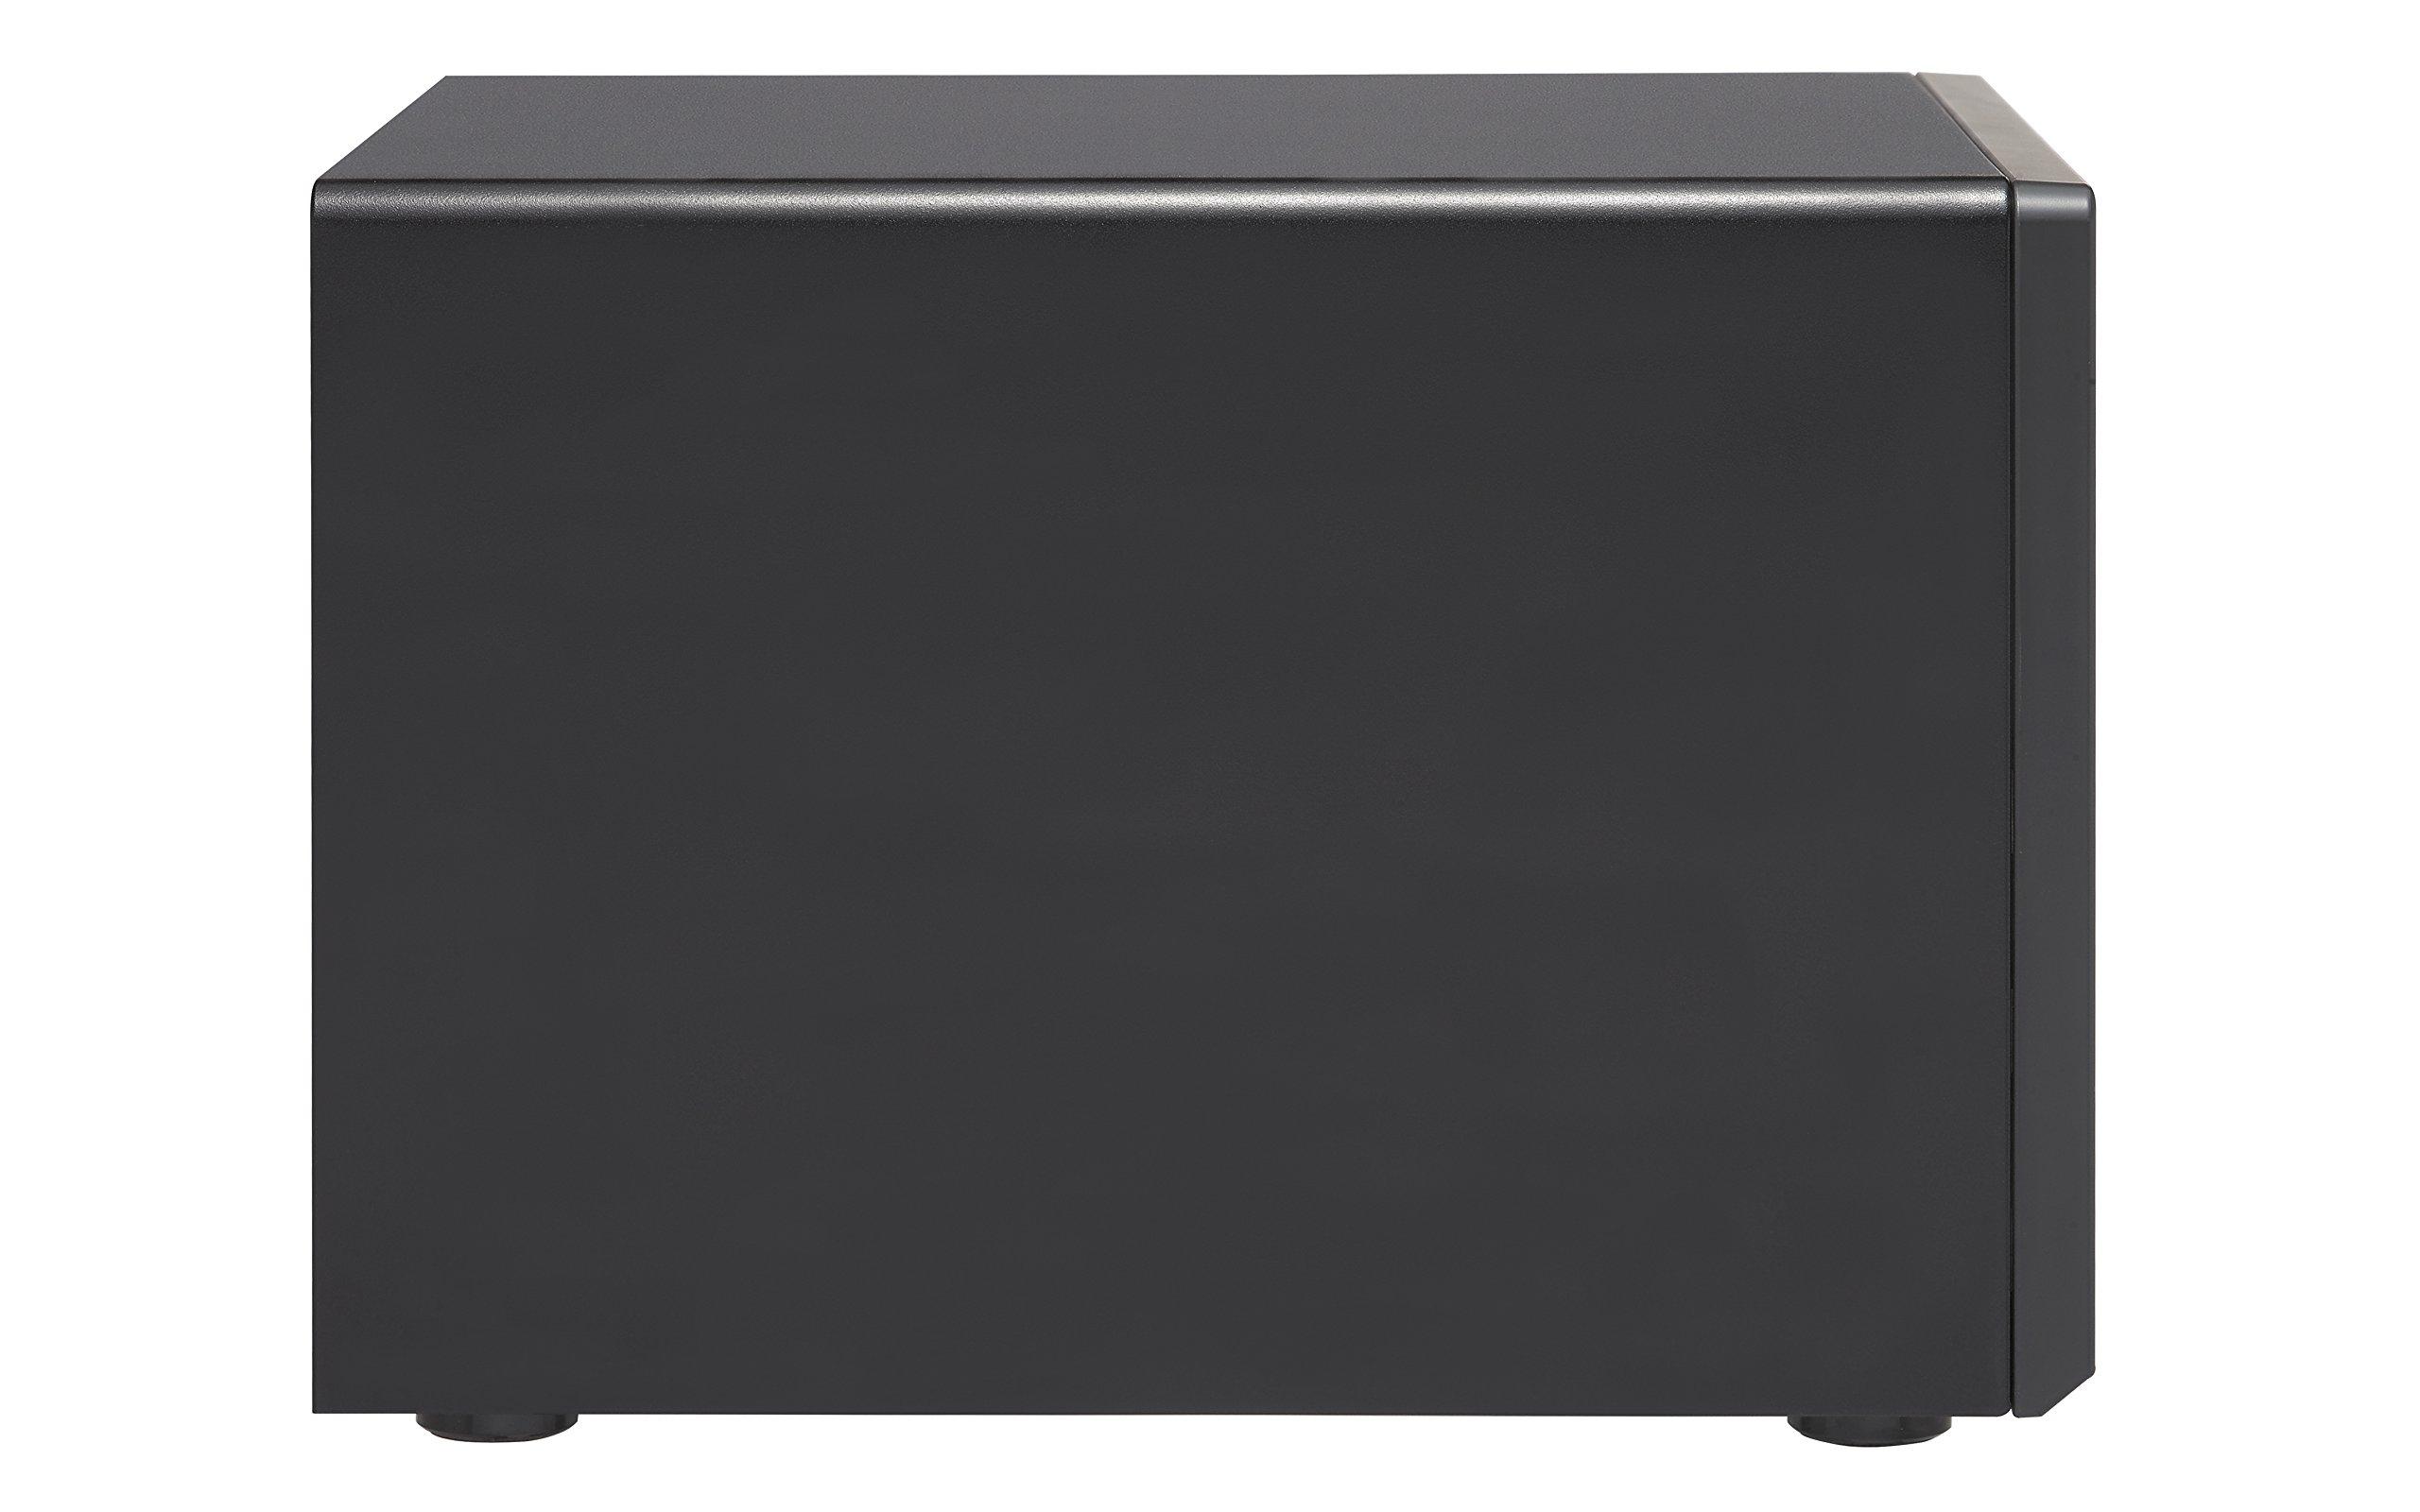 Qnap TVS-1282-i7-64G-US High Performance 12 bay (8+4) NAS/iSCSI IP-SAN, Intel Skylake Core i7-6700 3.4 GHz Quad Core, 32GB RAM, 10G-ready by QNAP (Image #3)